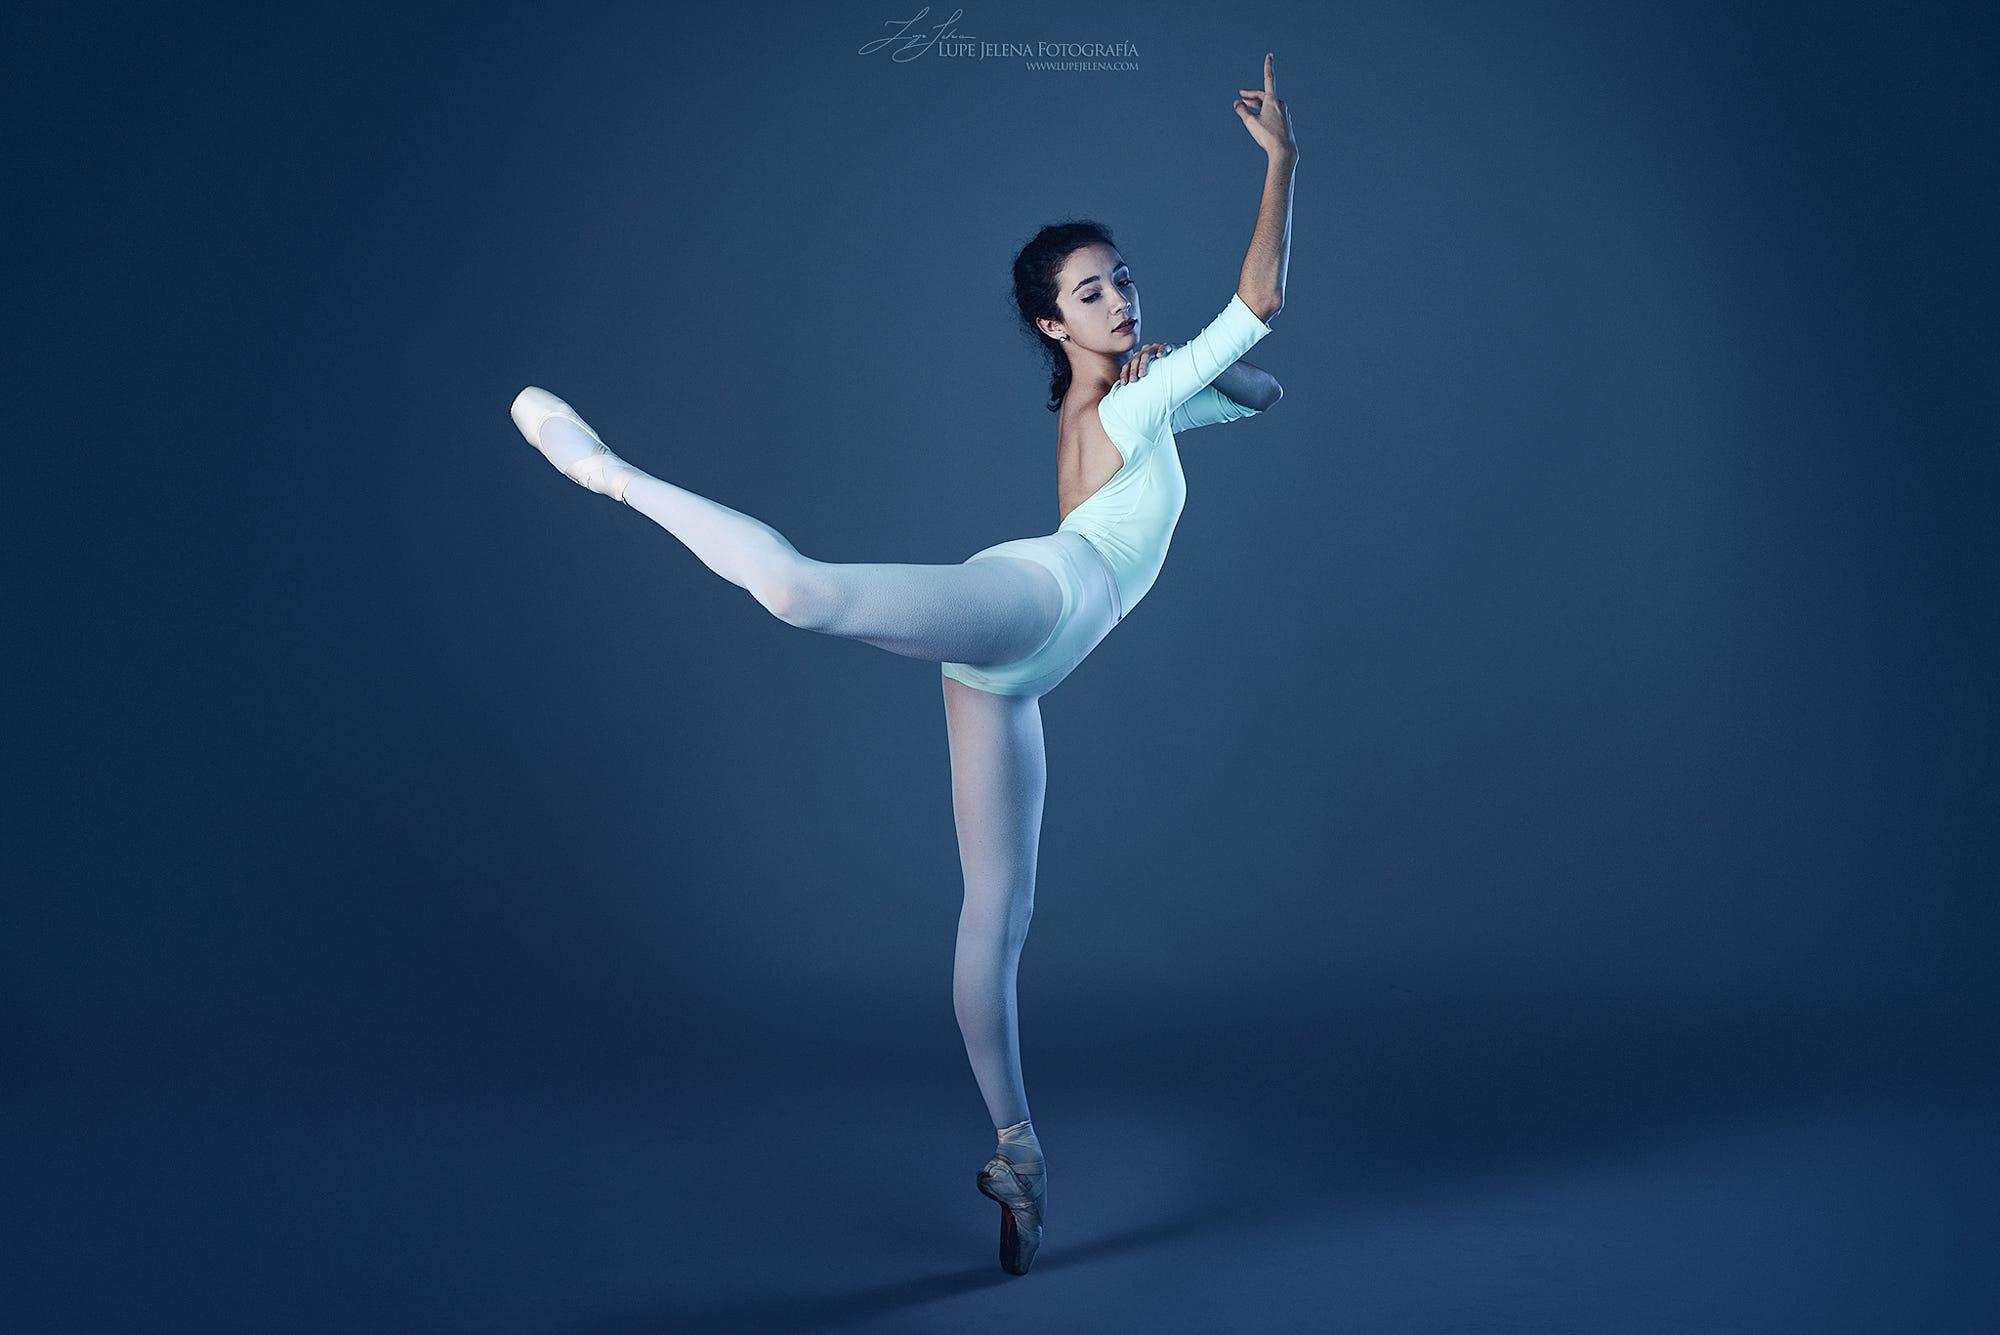 Wallpaper Lupe Jelena Ballerina Dancer Women 2000x1335 Wallpapermaniac 1157997 Hd Wallpapers Wallhere